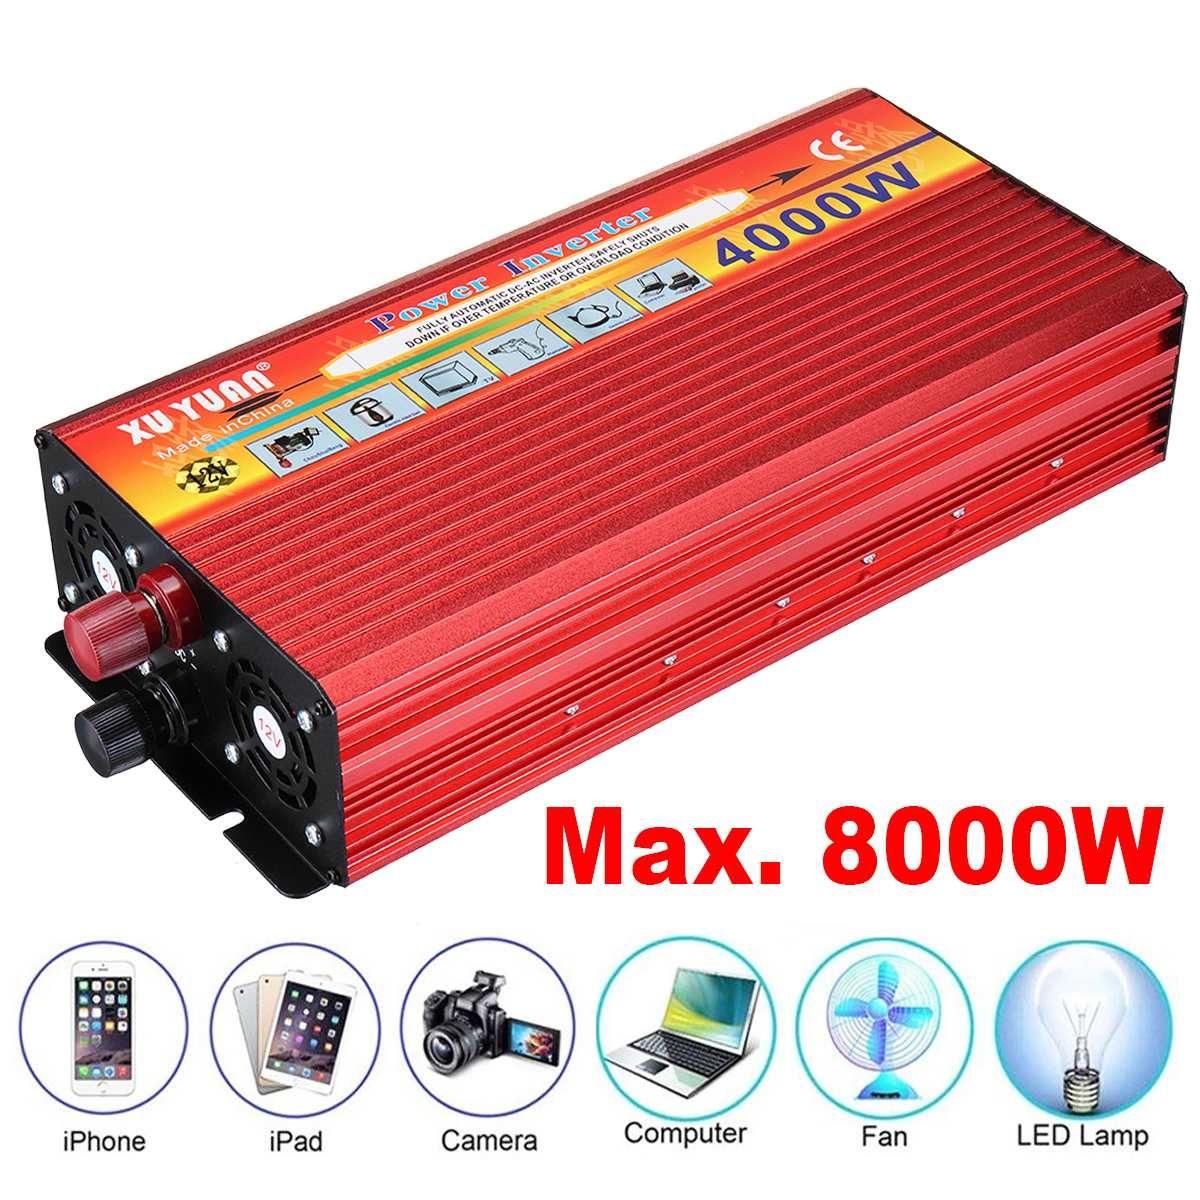 New 4000W Portable Max Power Inverter Car Converter Charger DC 12V To 110V 240V AC USB Vehicle Power Supply Converter